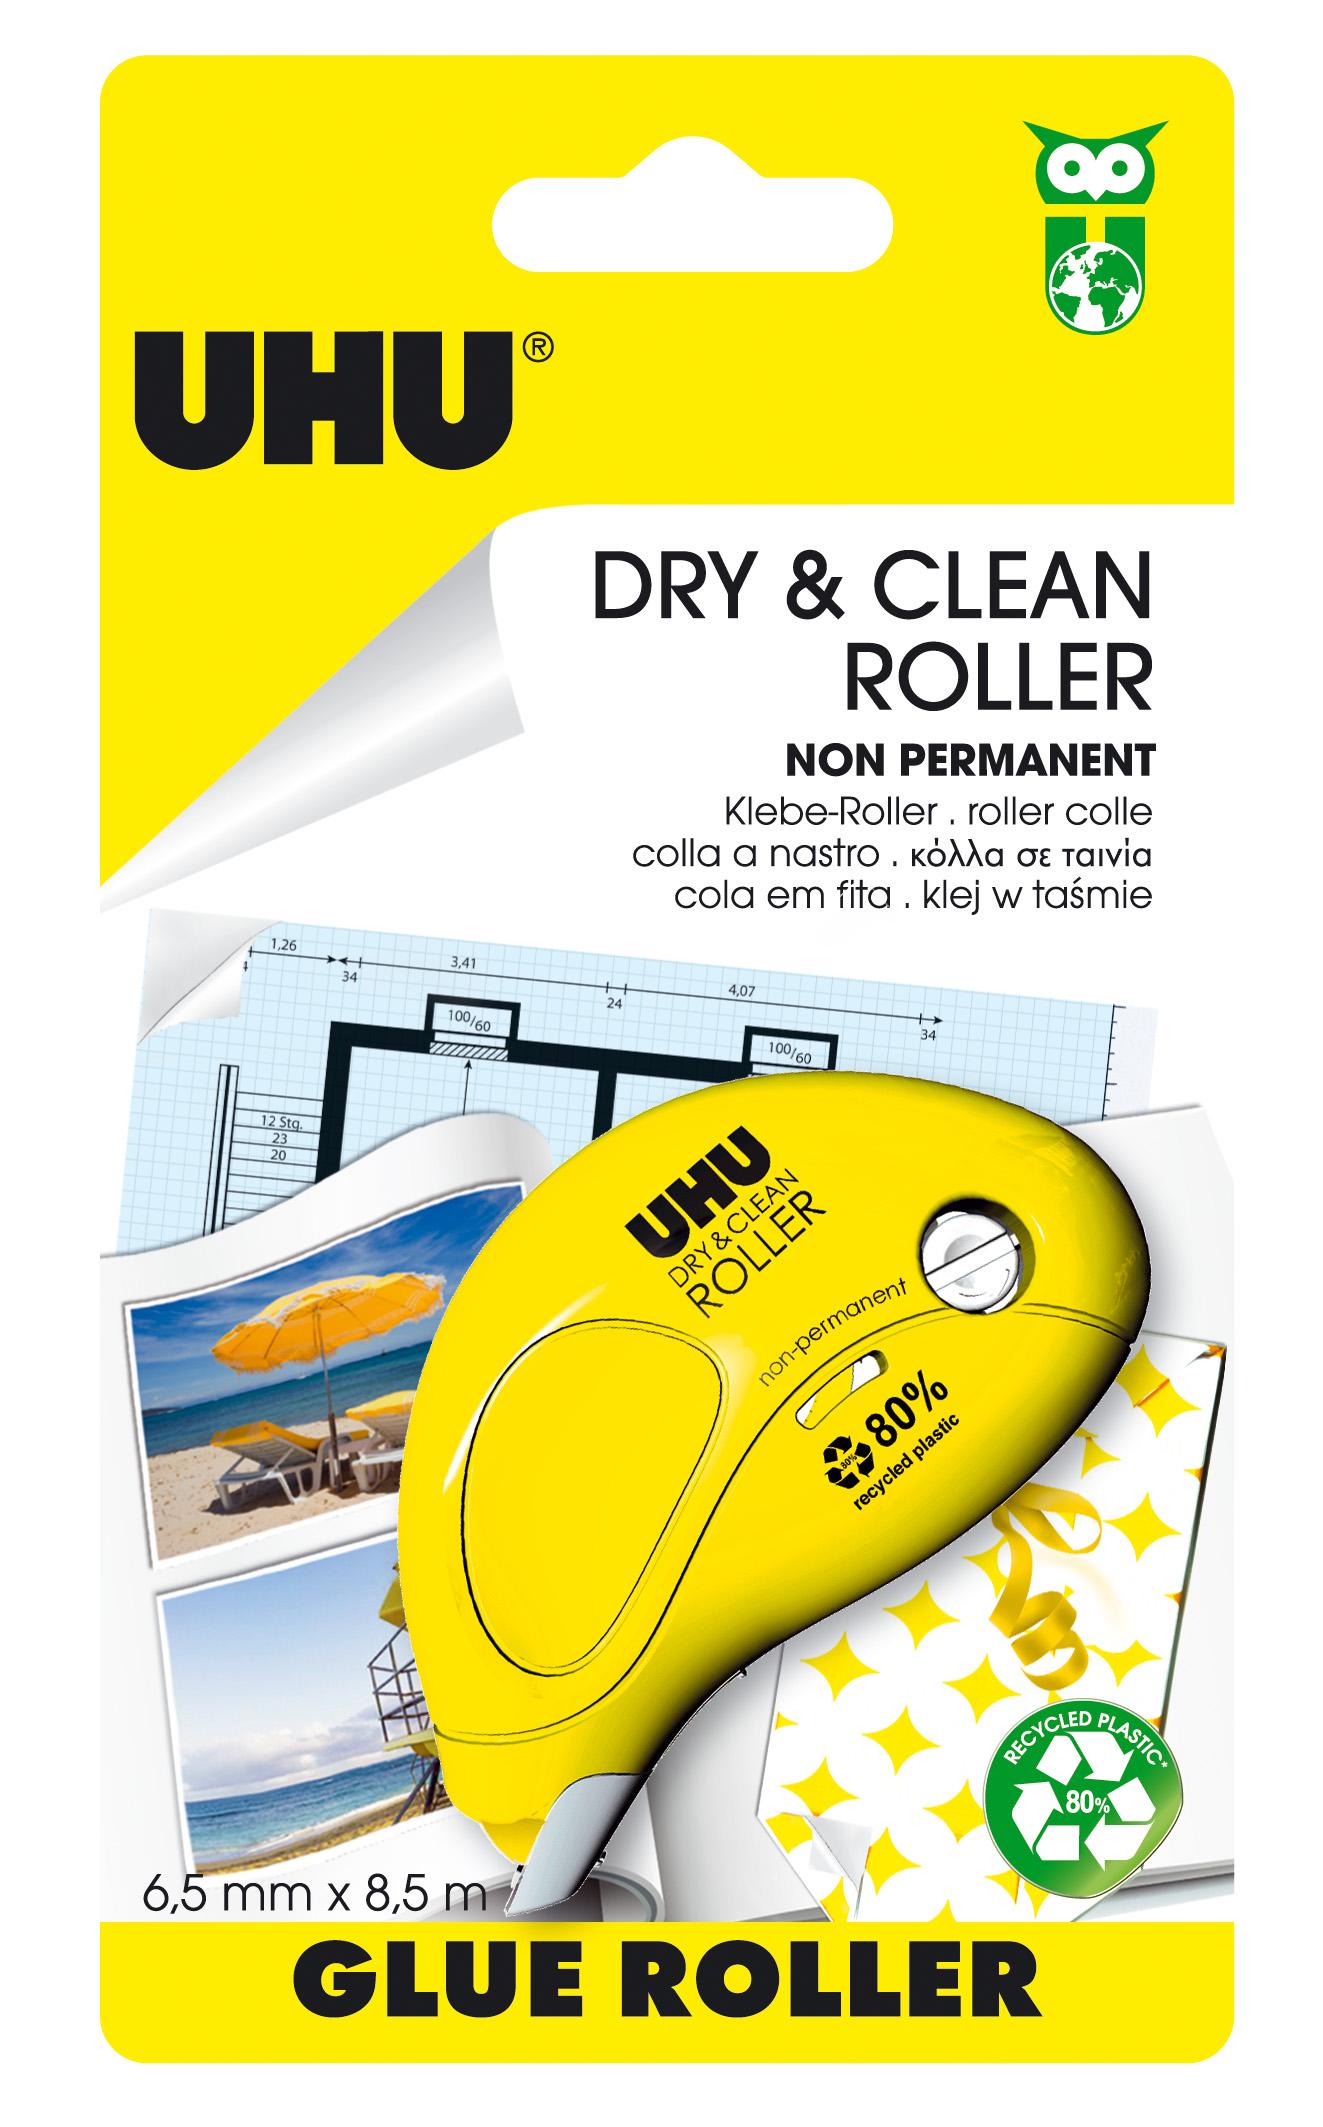 UHU Dry & Clean Roller Kleberoller, non-permanent, Infokarte